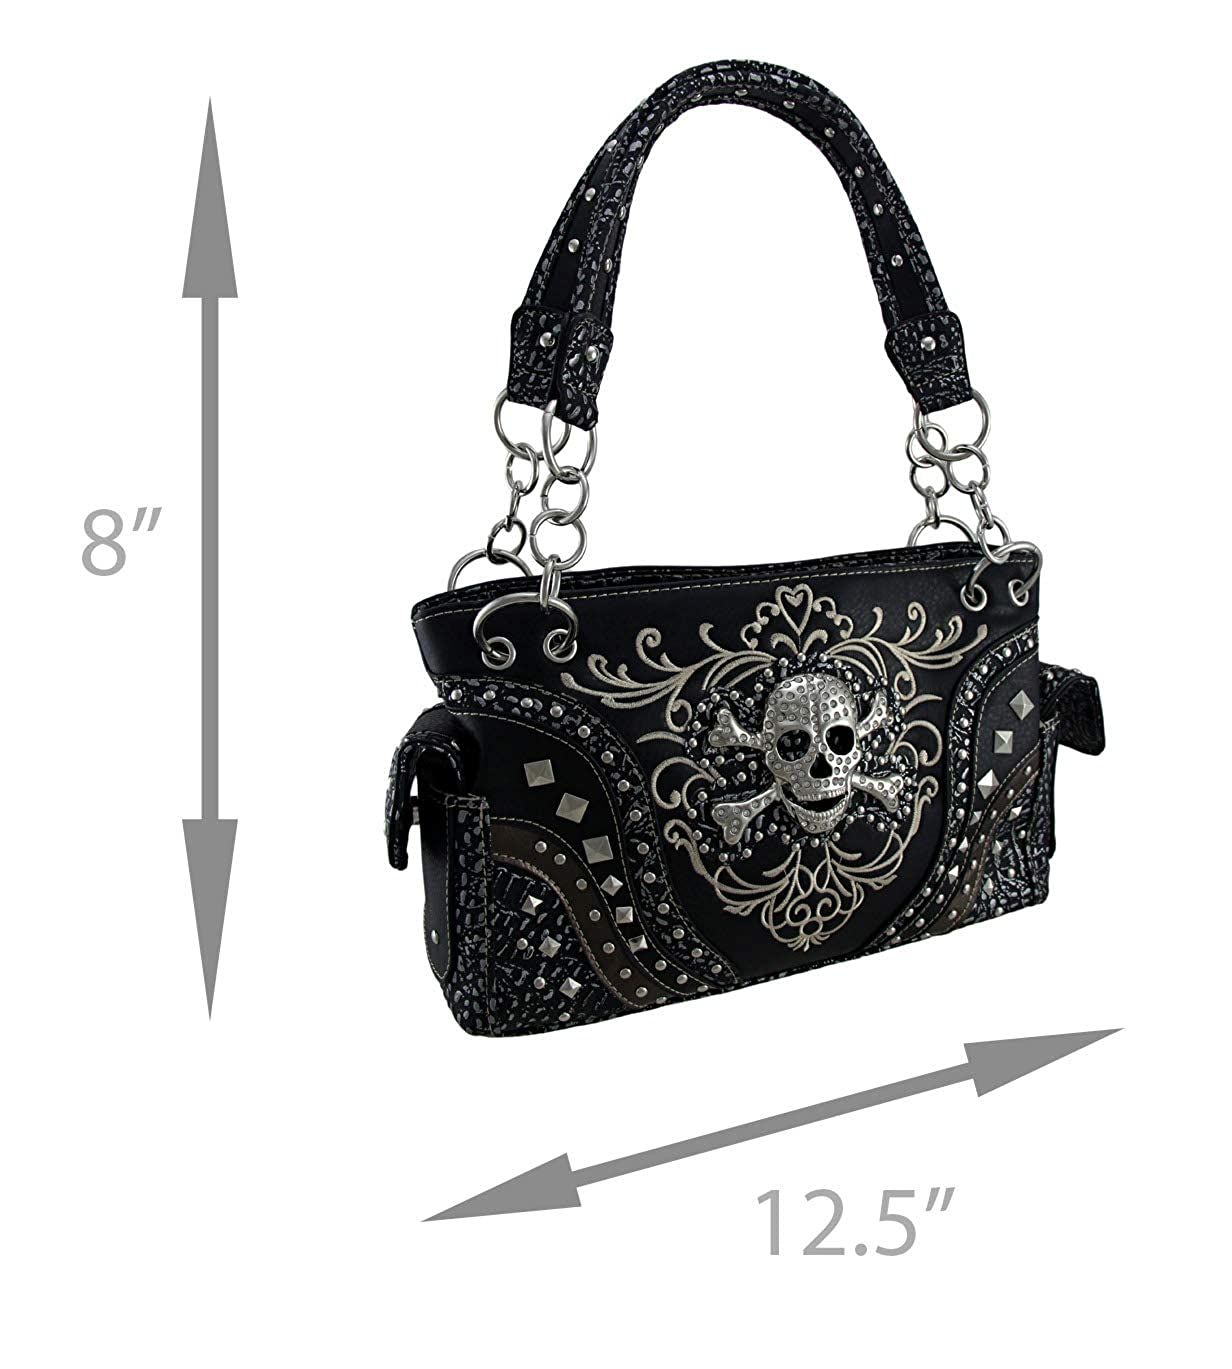 b309576c97 Embroidered Concealed Carry Rhinestone Skull Studded Purse  Handbags   Amazon.com